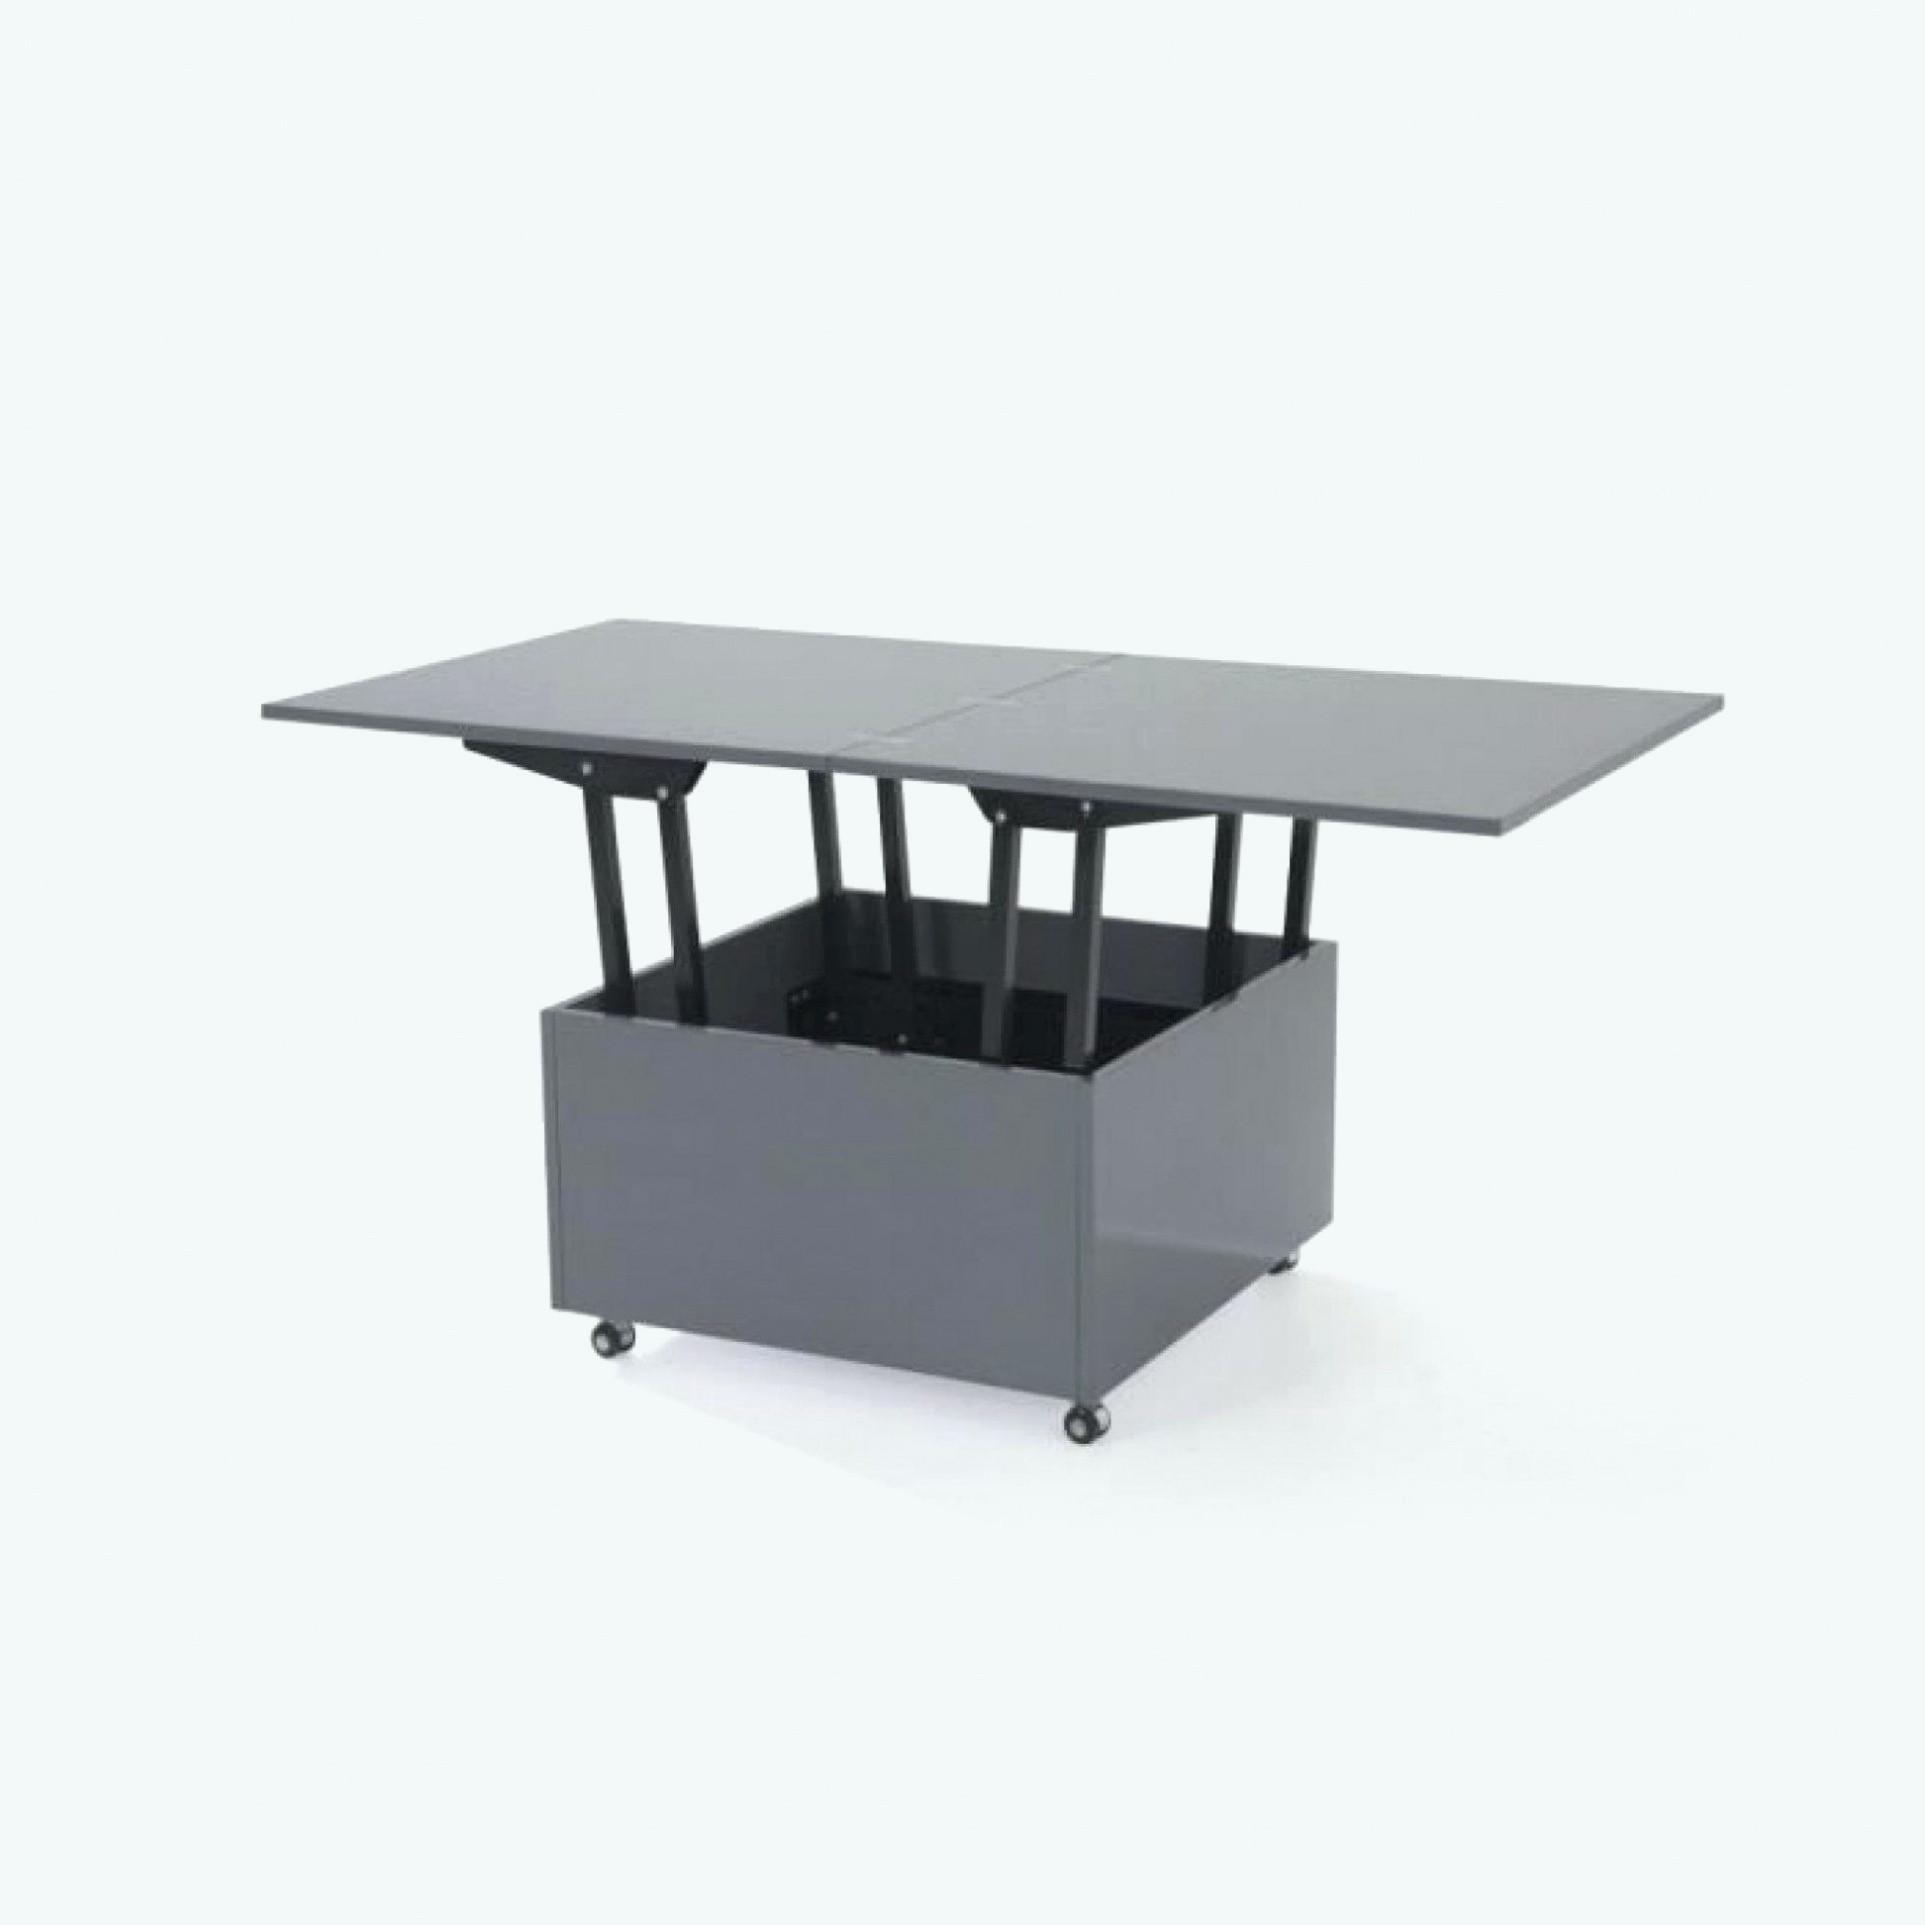 impressionnant chaise bois moderne maha de table ovale bois mahagranda de home idees astucieuses